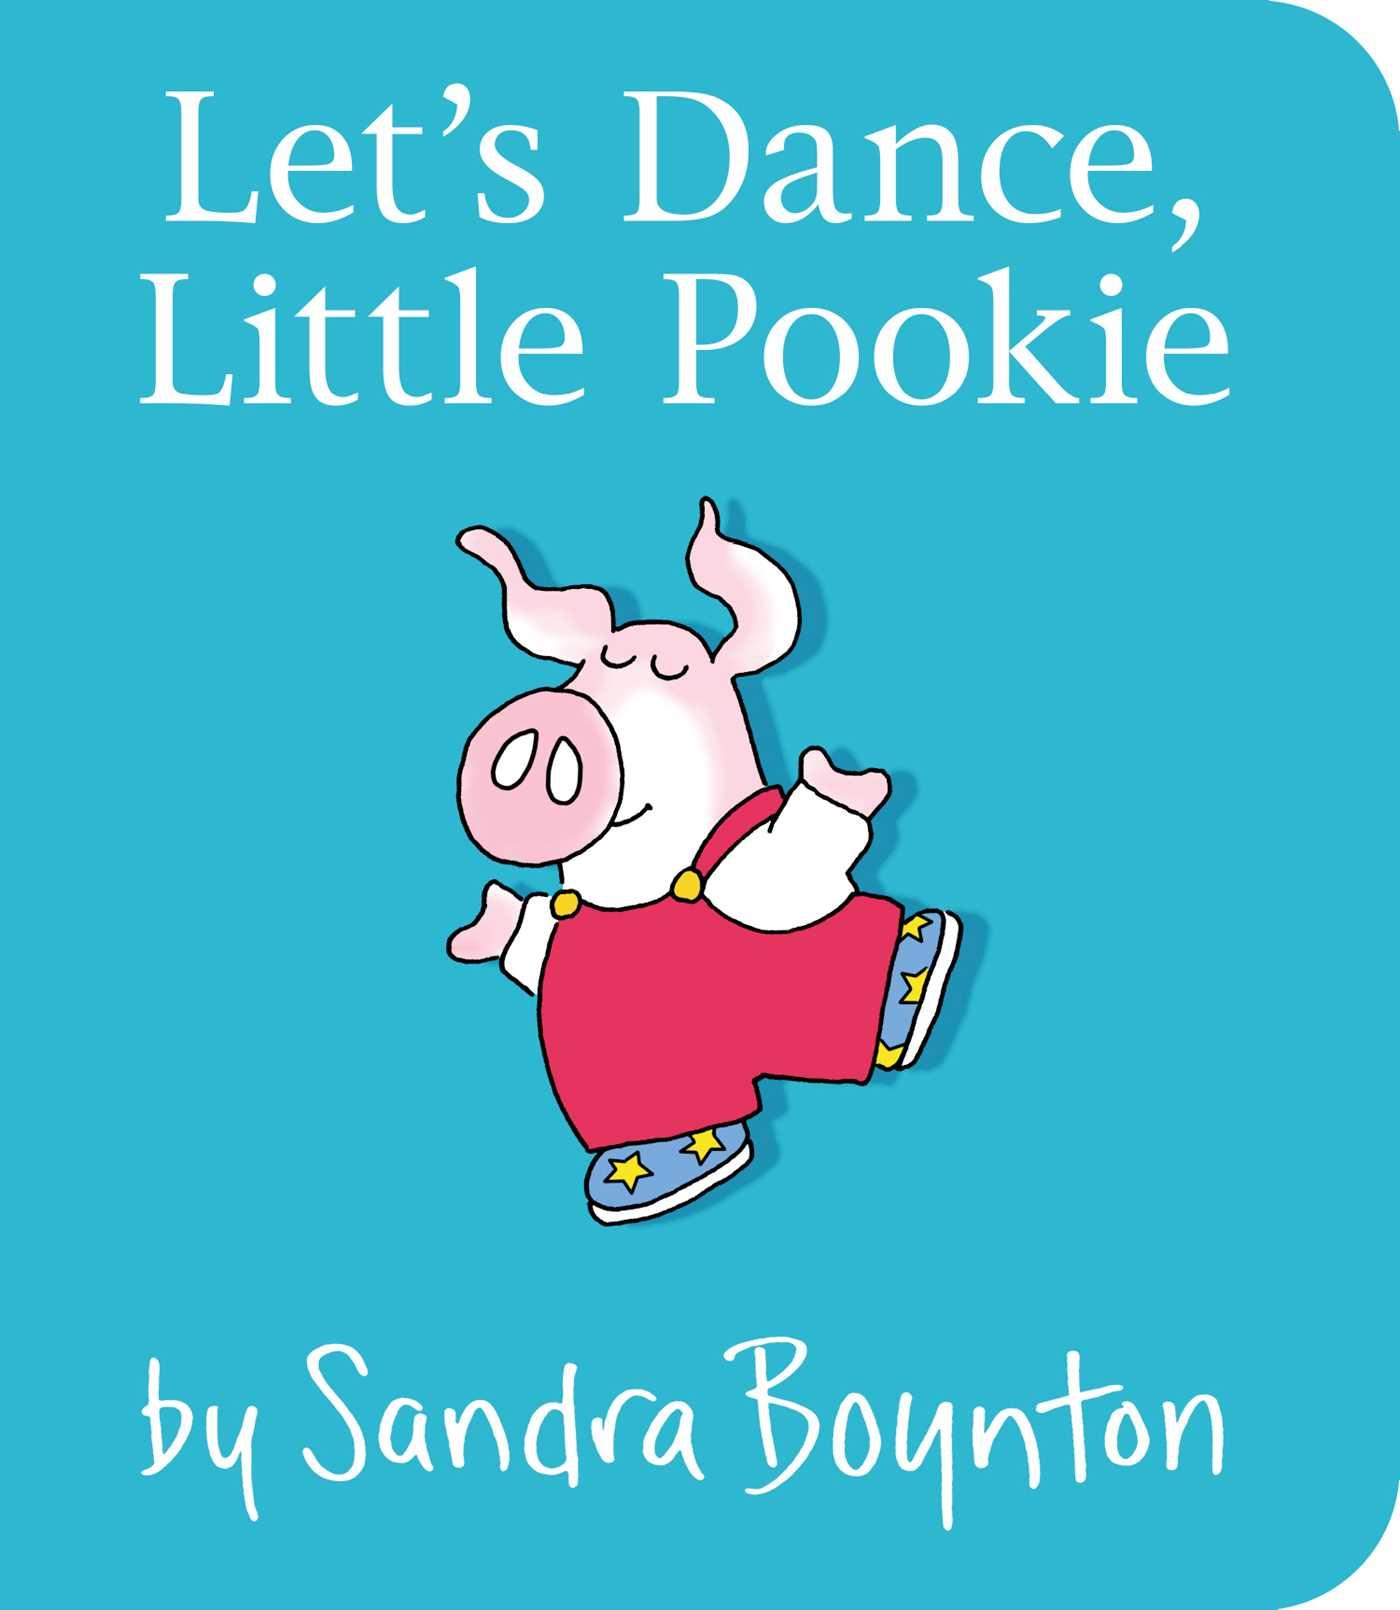 Lets dance little pookie 9781481497725 hr